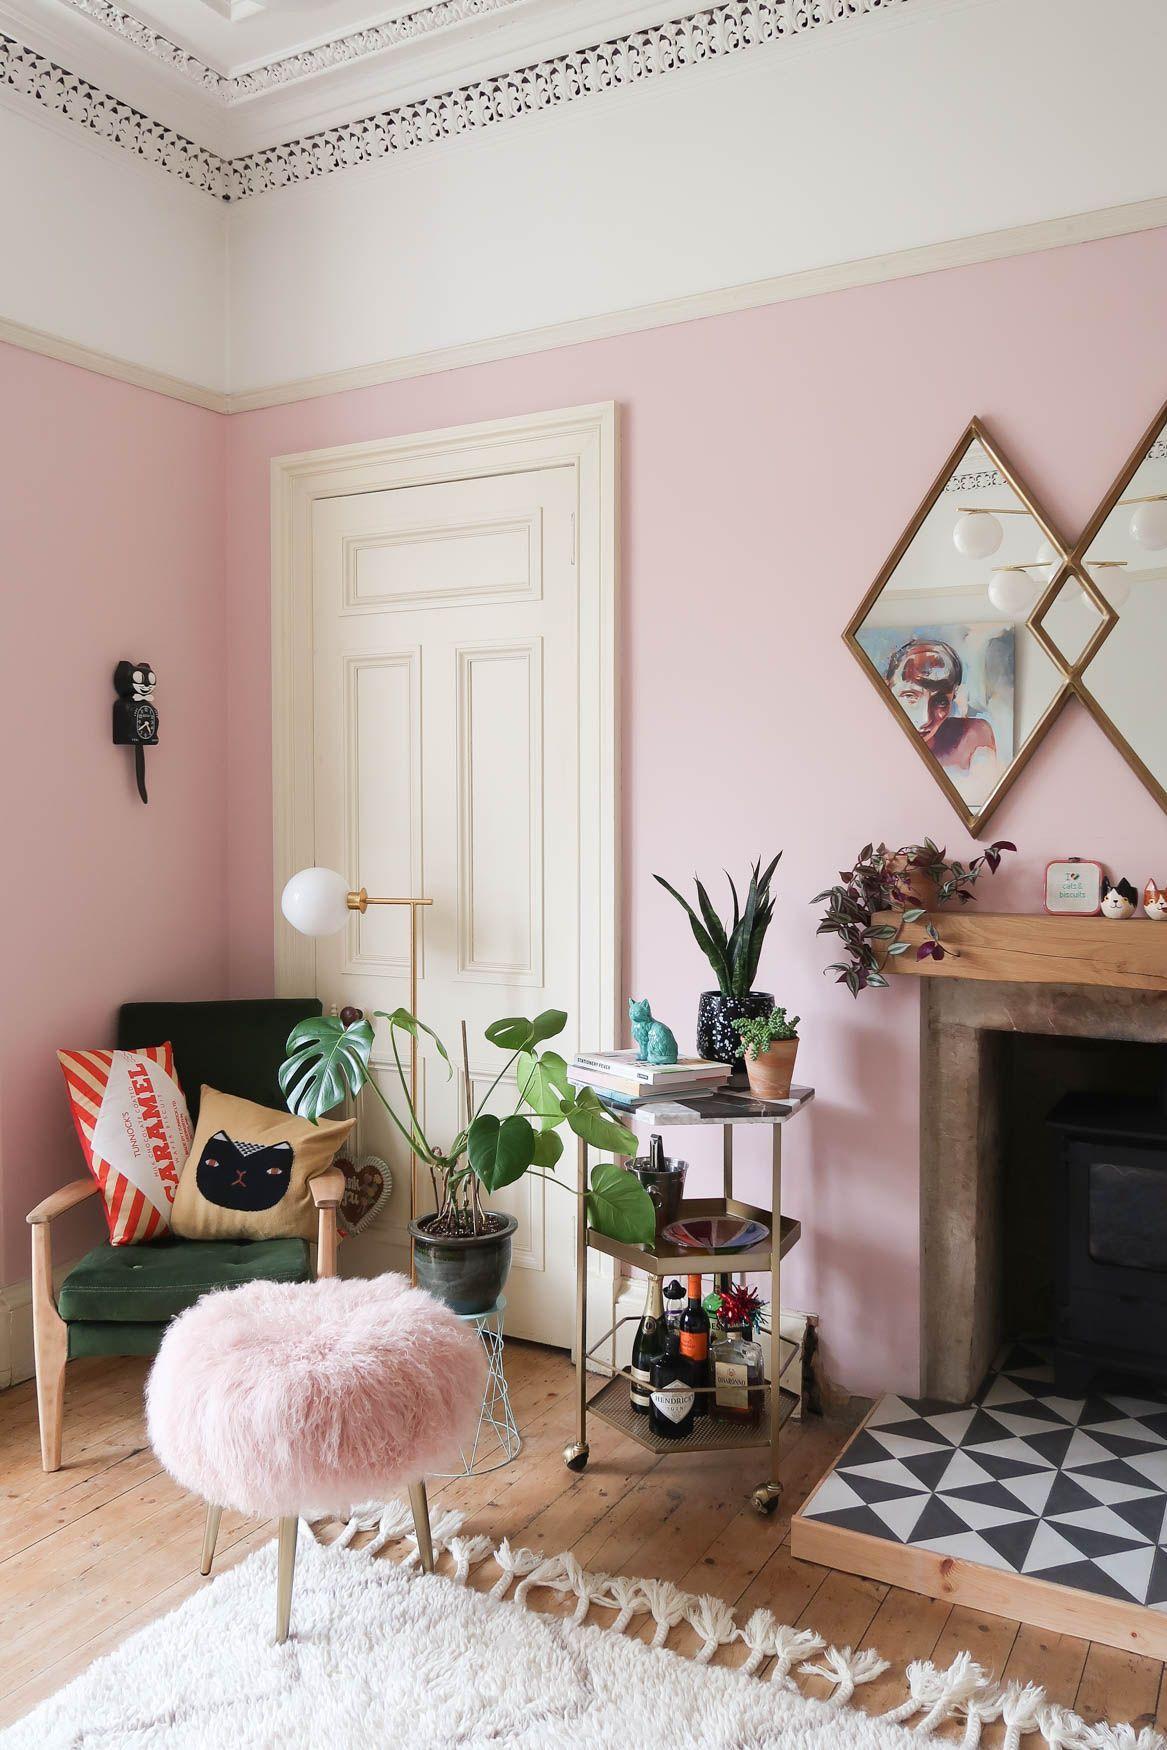 Bathroom Counter Decor Living The Pink Lounge Dream Nikki